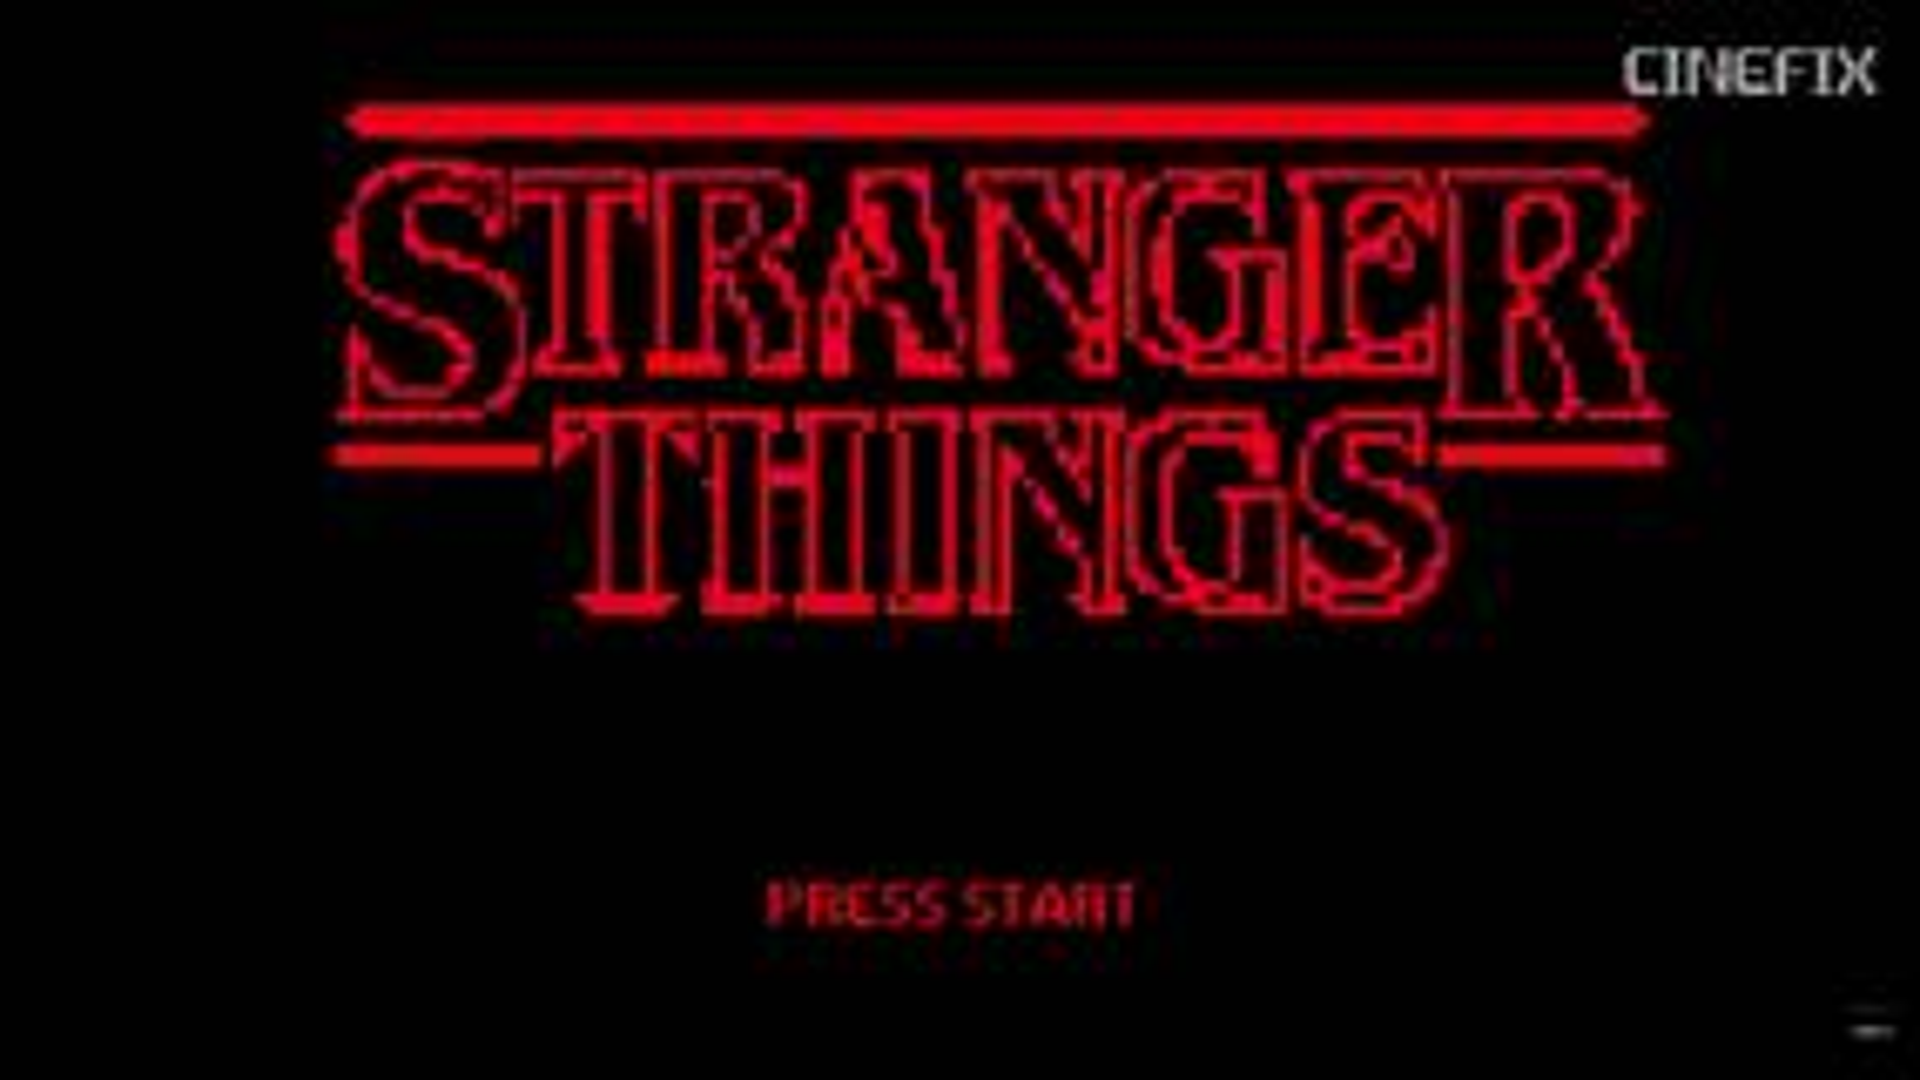 Image for Stranger Things gets an 8-bit videogame makeover courtesy of 8-bit Cinema